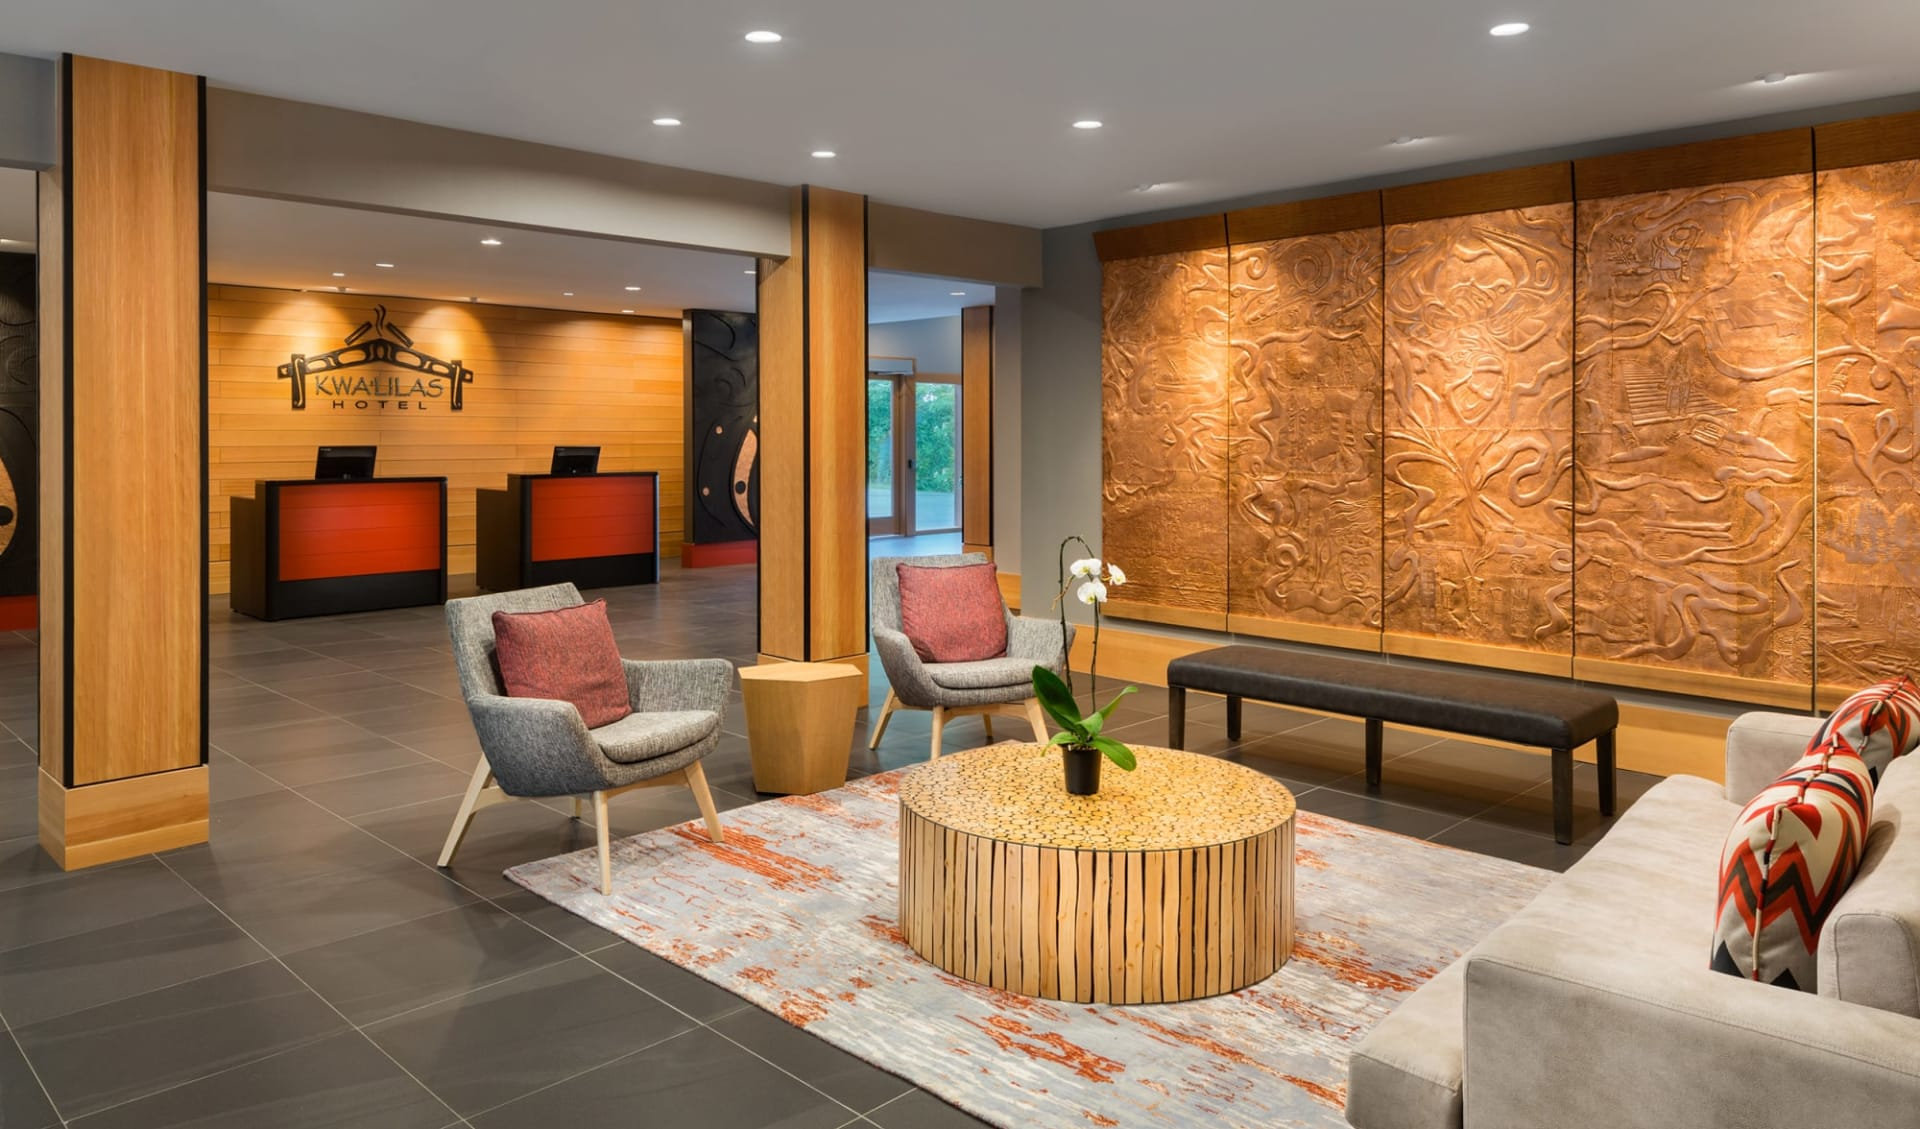 Kwa'Lilas Hotel in Port Hardy: Facilities_Kwa'Lilas Hotel_Lobby_Jonview